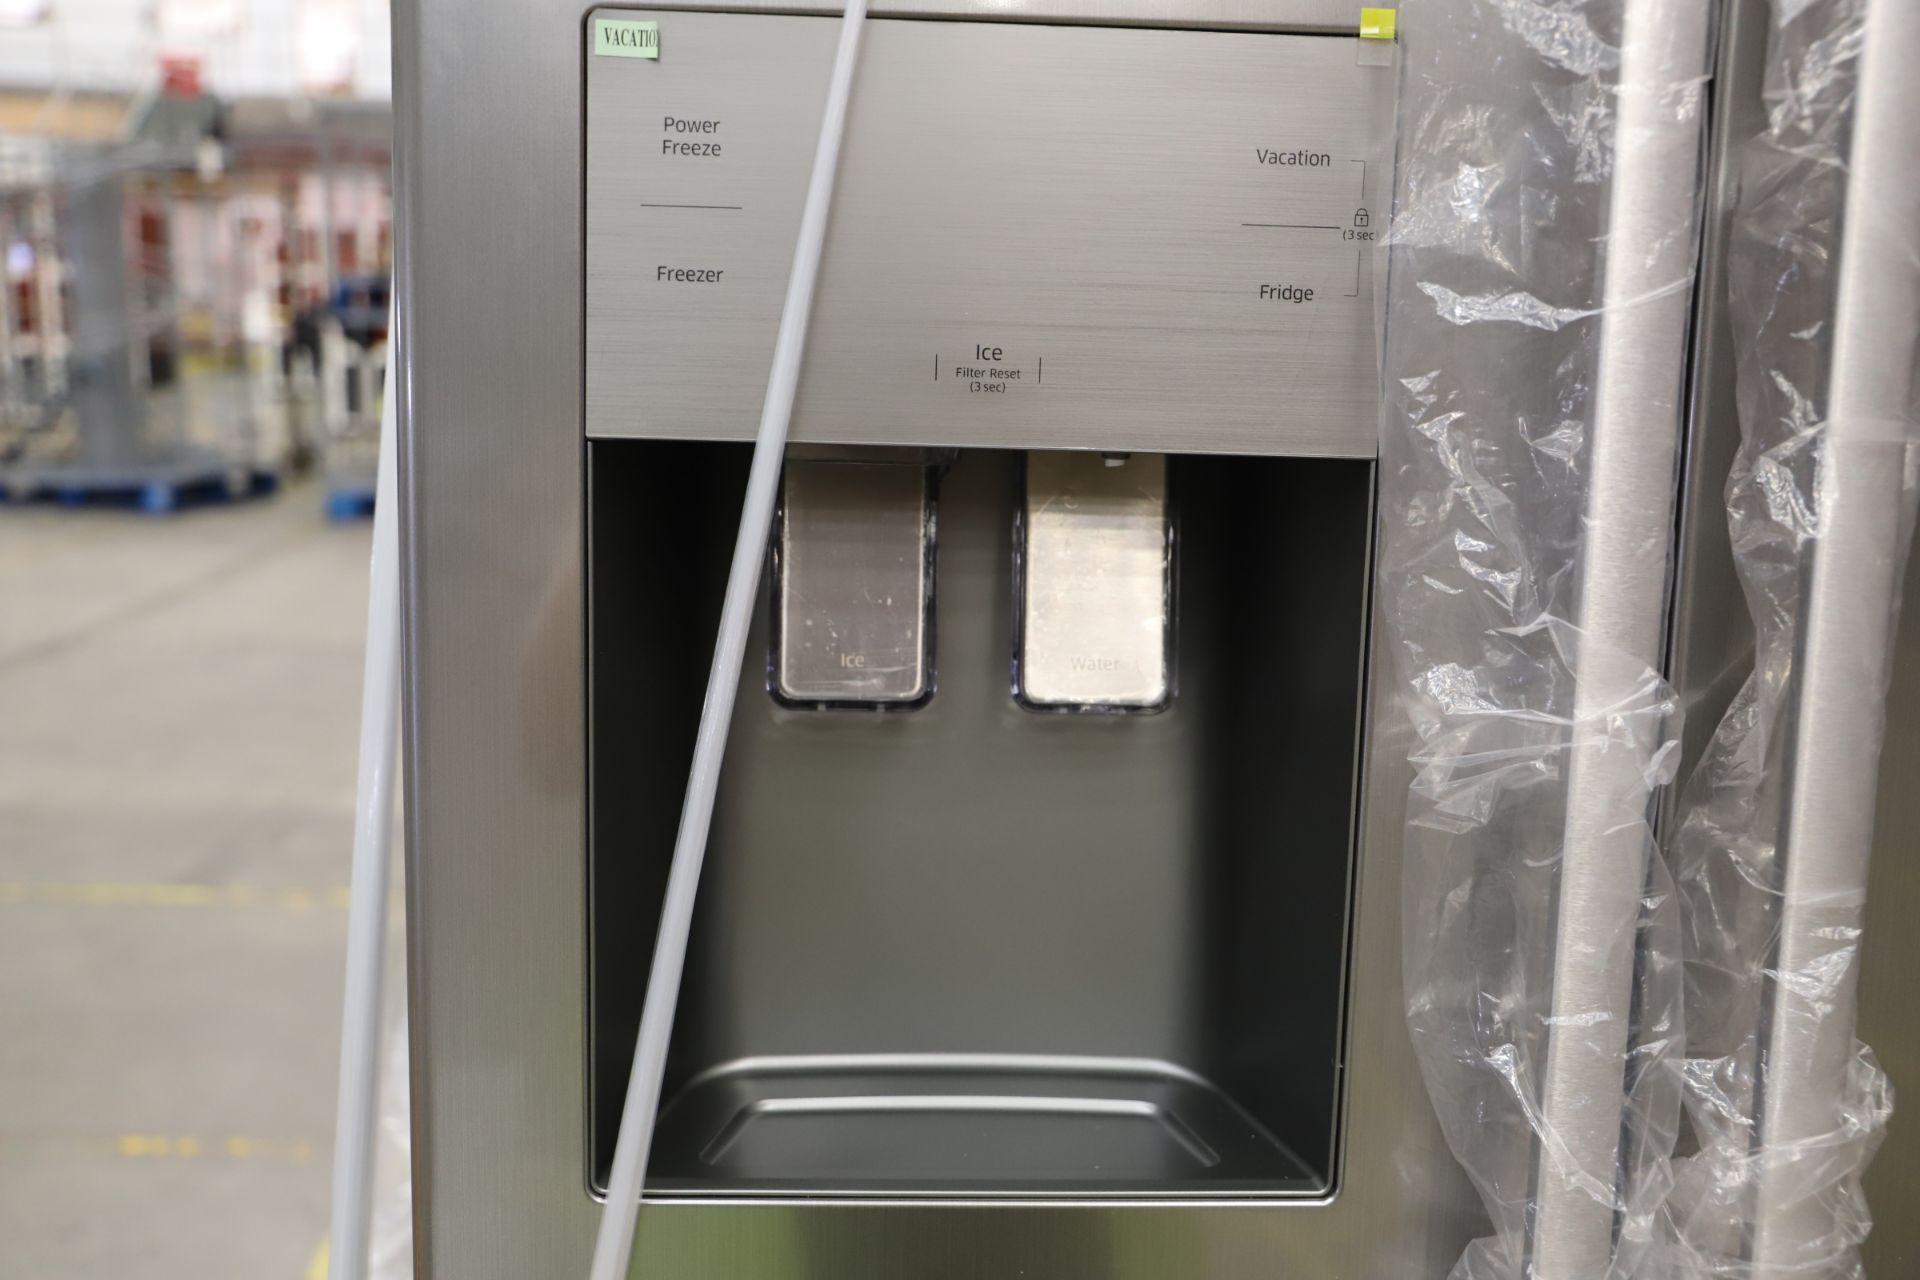 Pallet of 1 Samsung Water & Ice Fridge freezer. Latest selling price £929.99* - Image 8 of 9